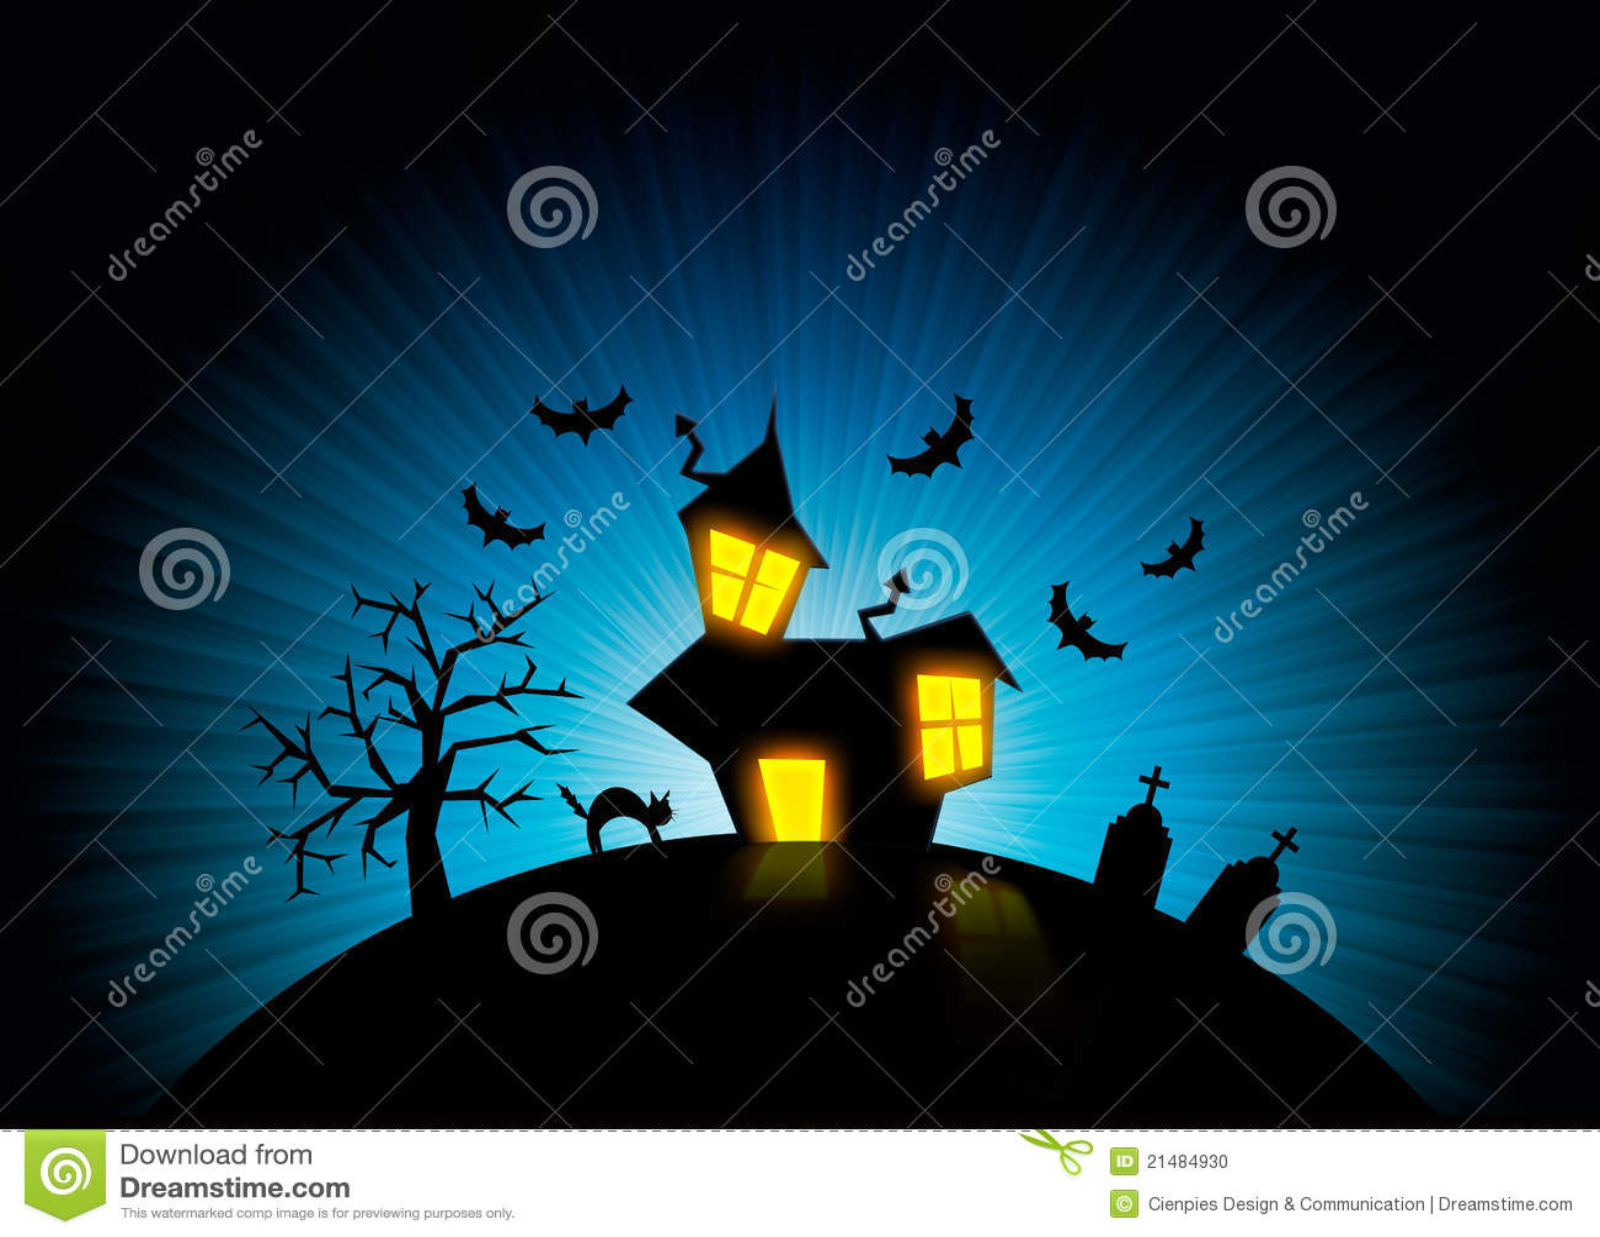 background cat halloween house night nightmare - Halloween Nightmare